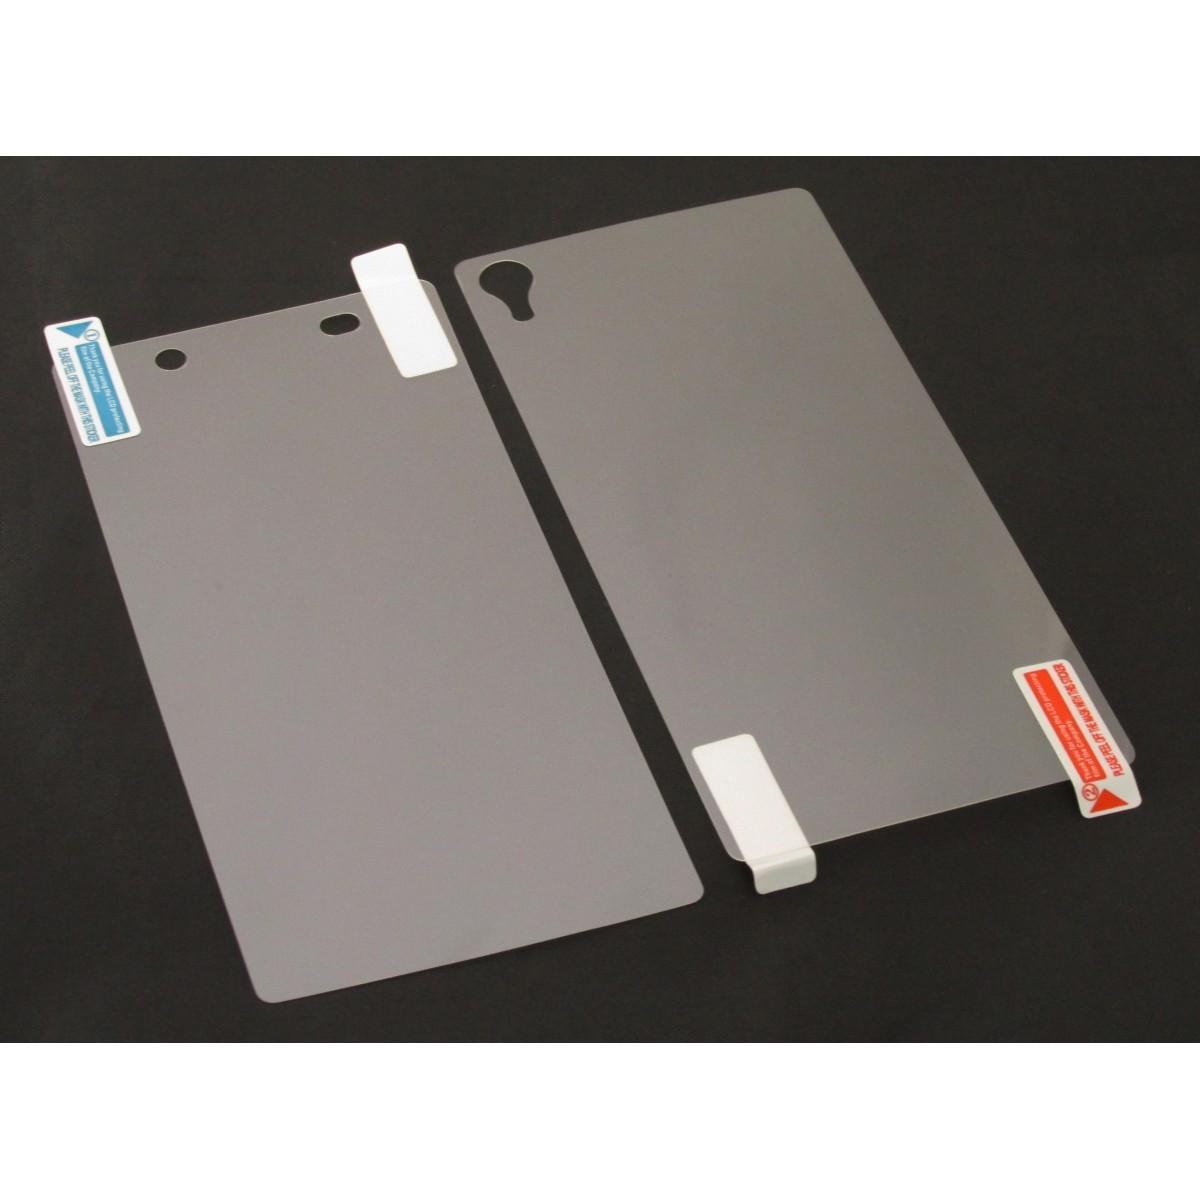 Película Protetora para Sony Xperia Z2 D6502 D6503 Frente e Verso - Fosca